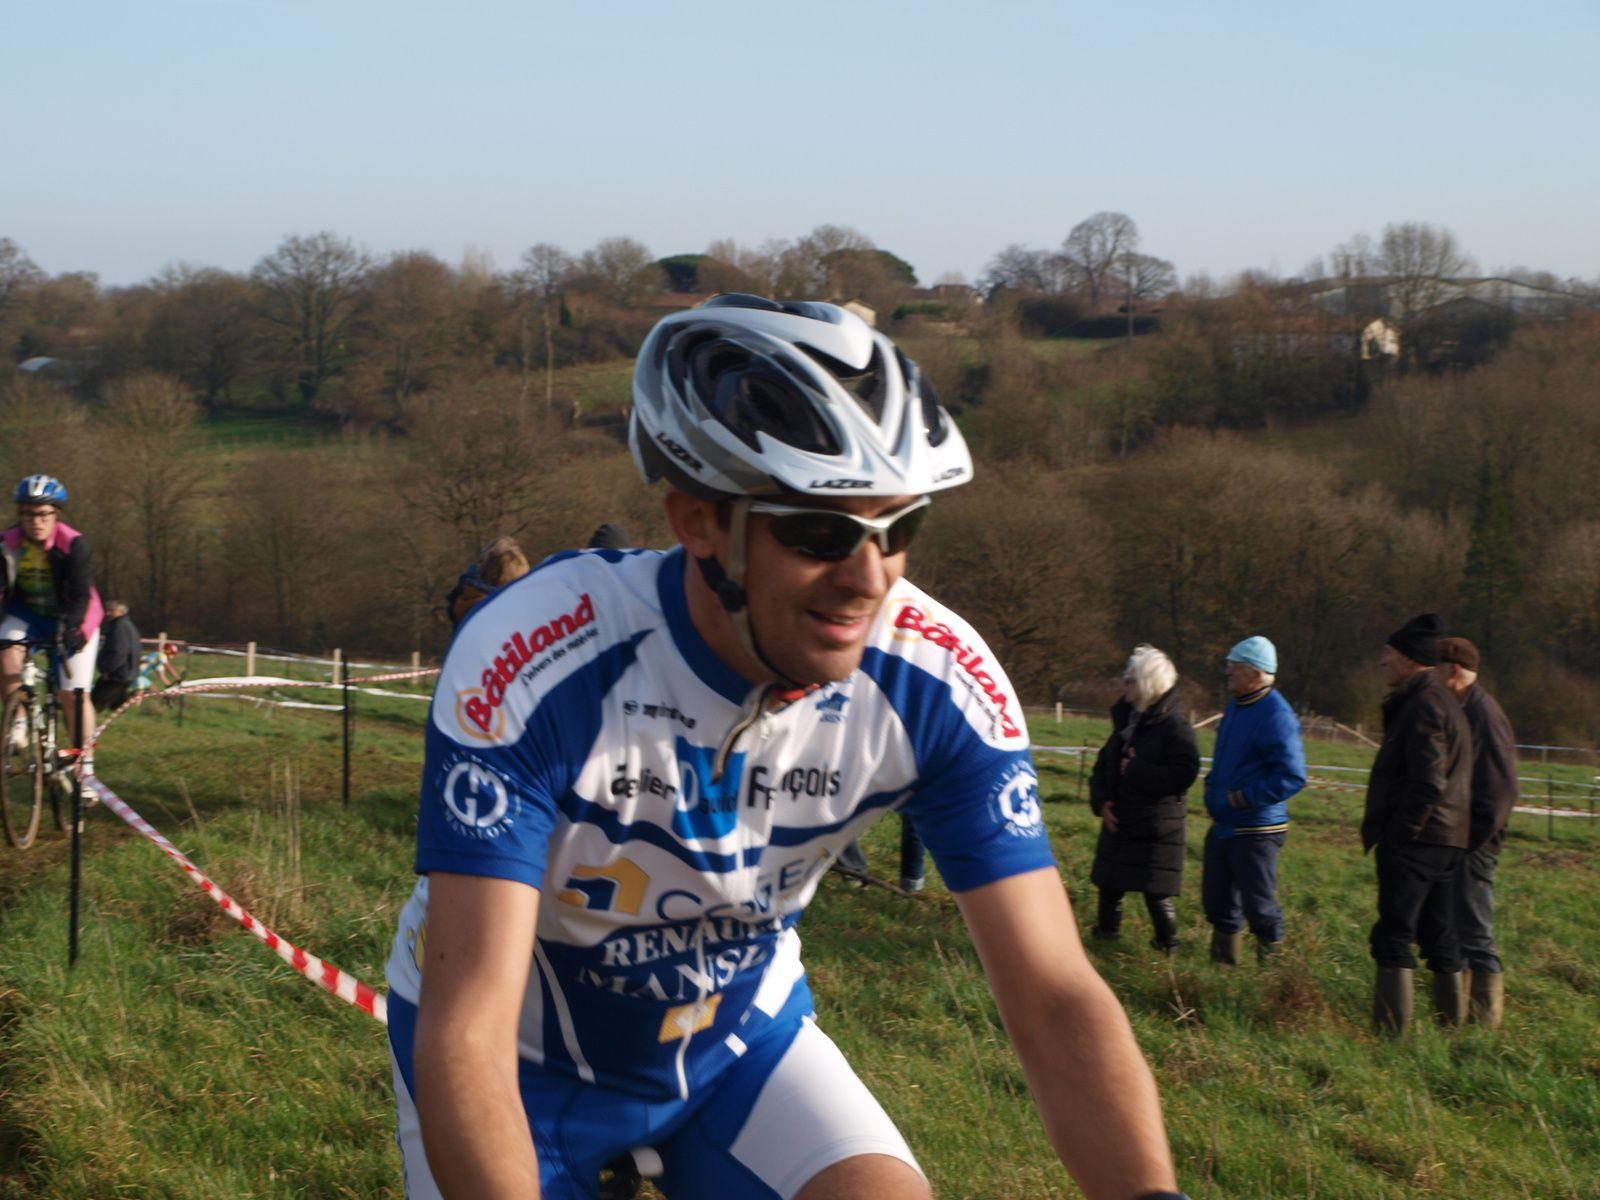 PHOTOS cyclo cross Sepvret 12-01-14